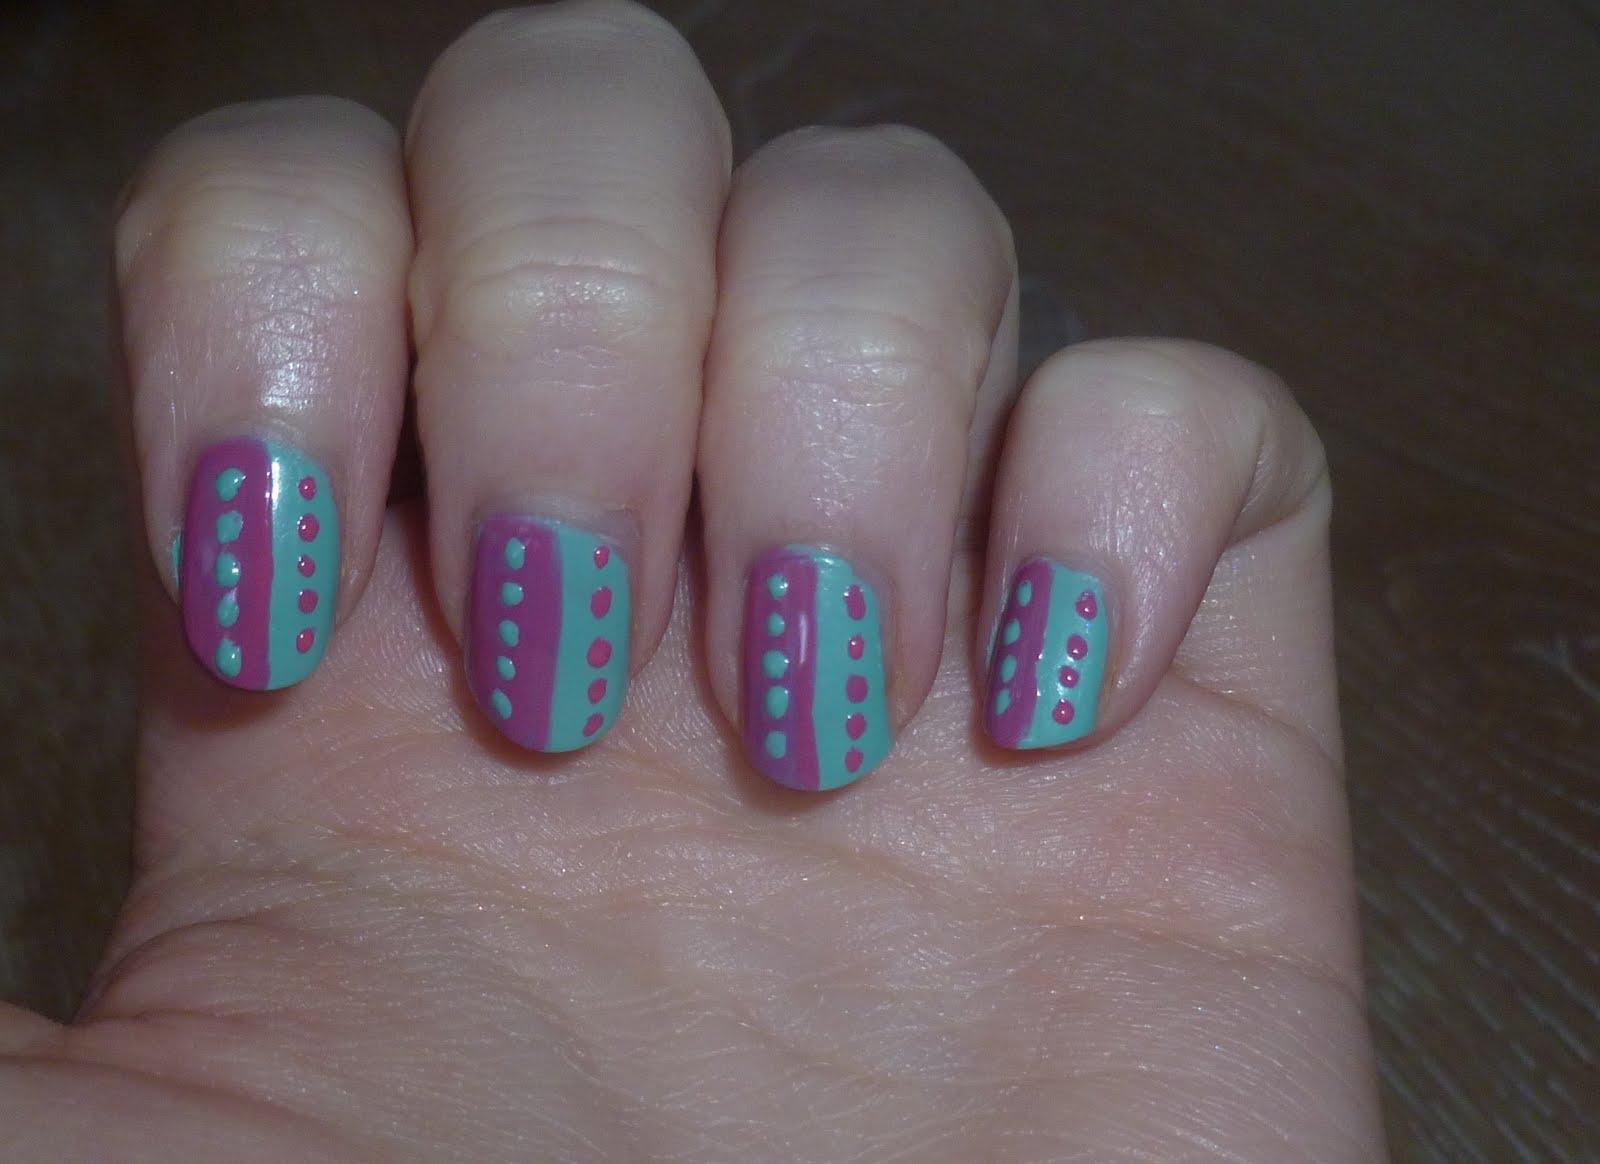 Spotty & Stripey Nails